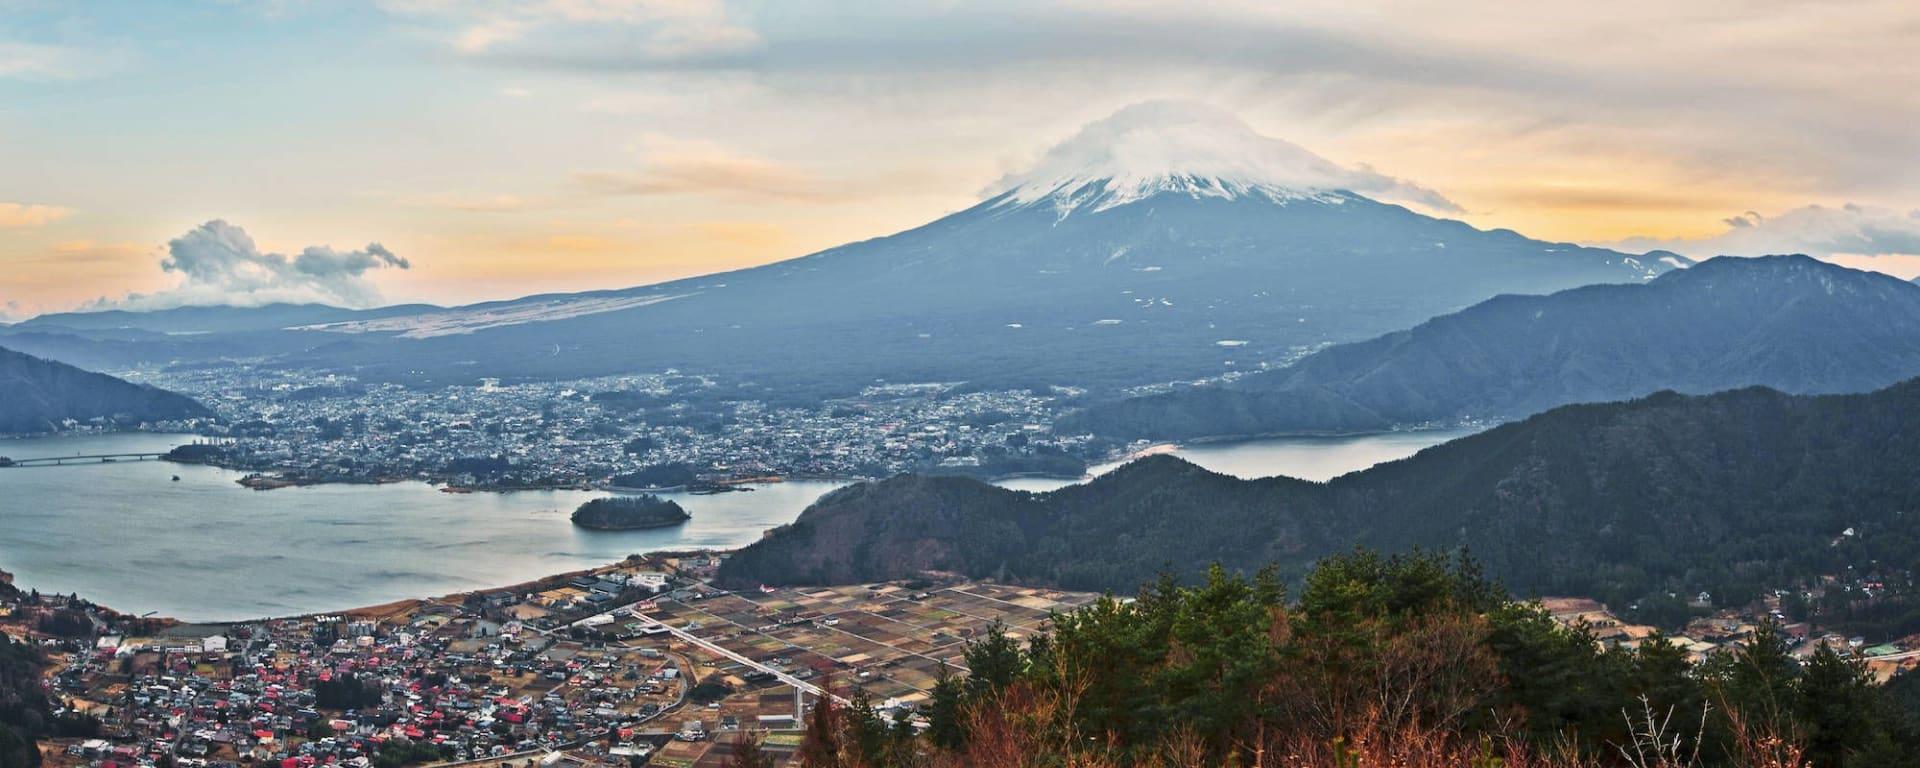 Circuit en groupe «Geisha» de Tokyo: Mt Fuji with lake Kawaguchiko